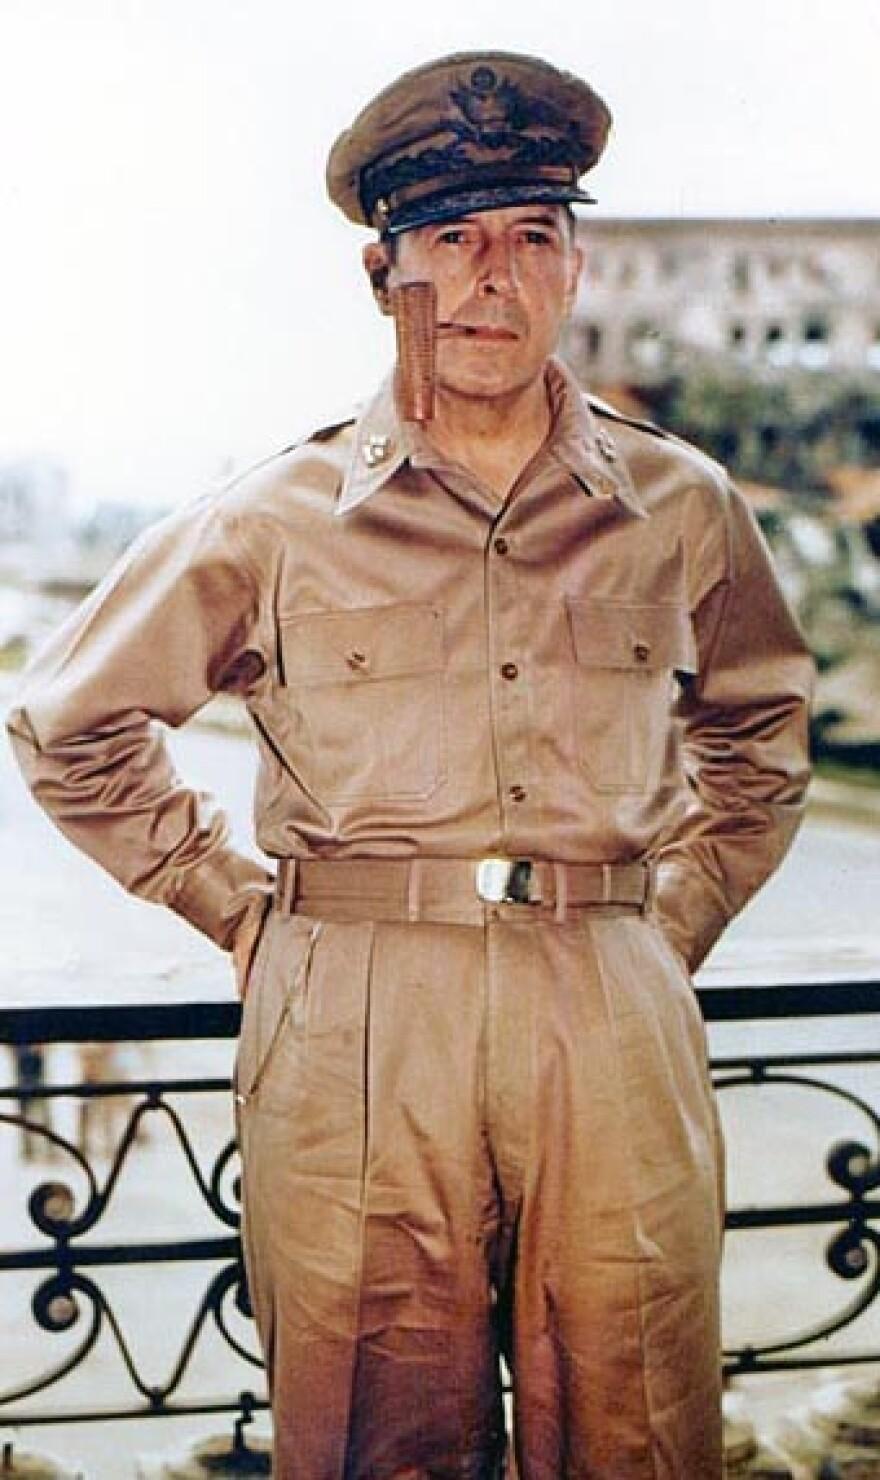 The Missouri Meerschaum Company still makes corn cob pipes like Gen. Douglas MacArthur smoked during World War II.